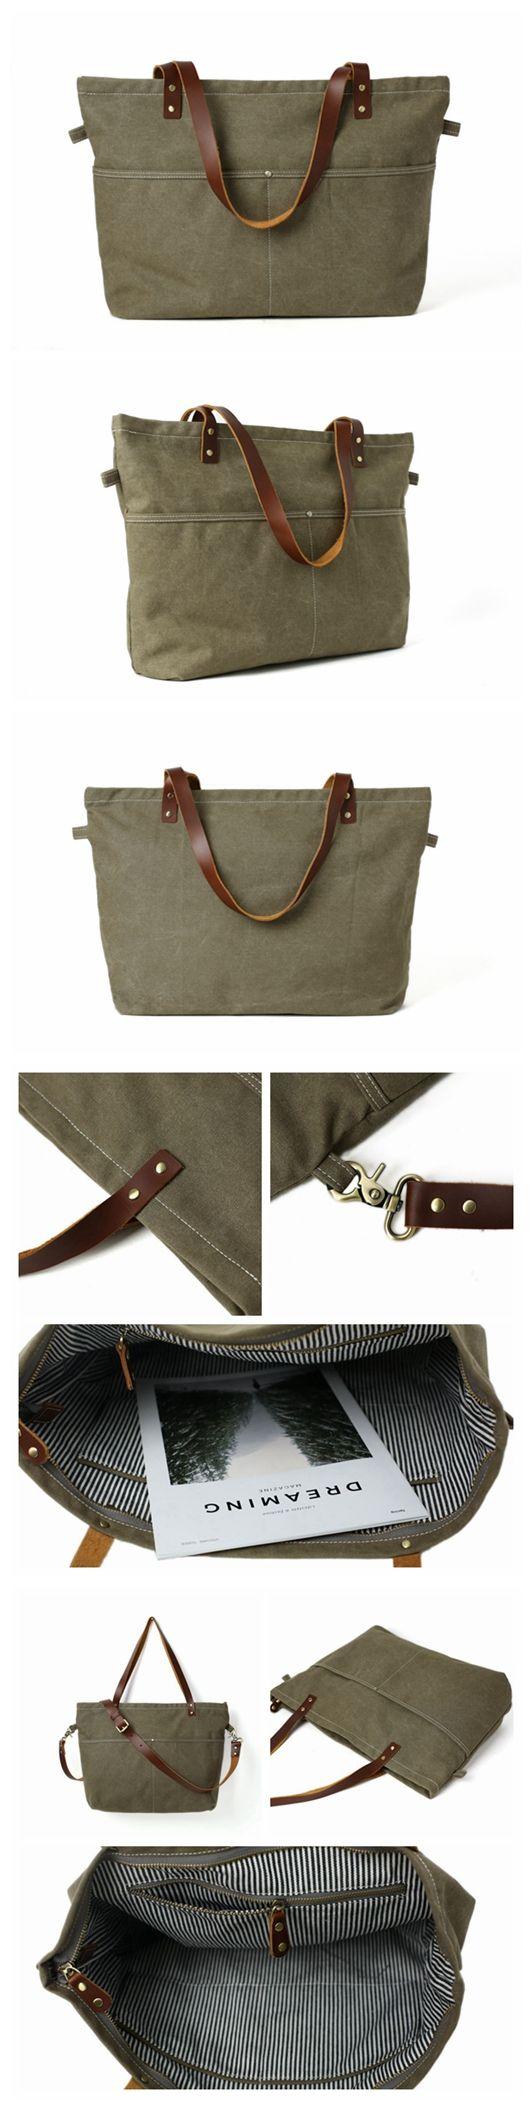 Handmade Canvas Tote Bag Messenger Bag Shopper Bag Shoulder Bag Handbag 14022 http://www.allthingsvogue.com/best-stylish-tote-bags/